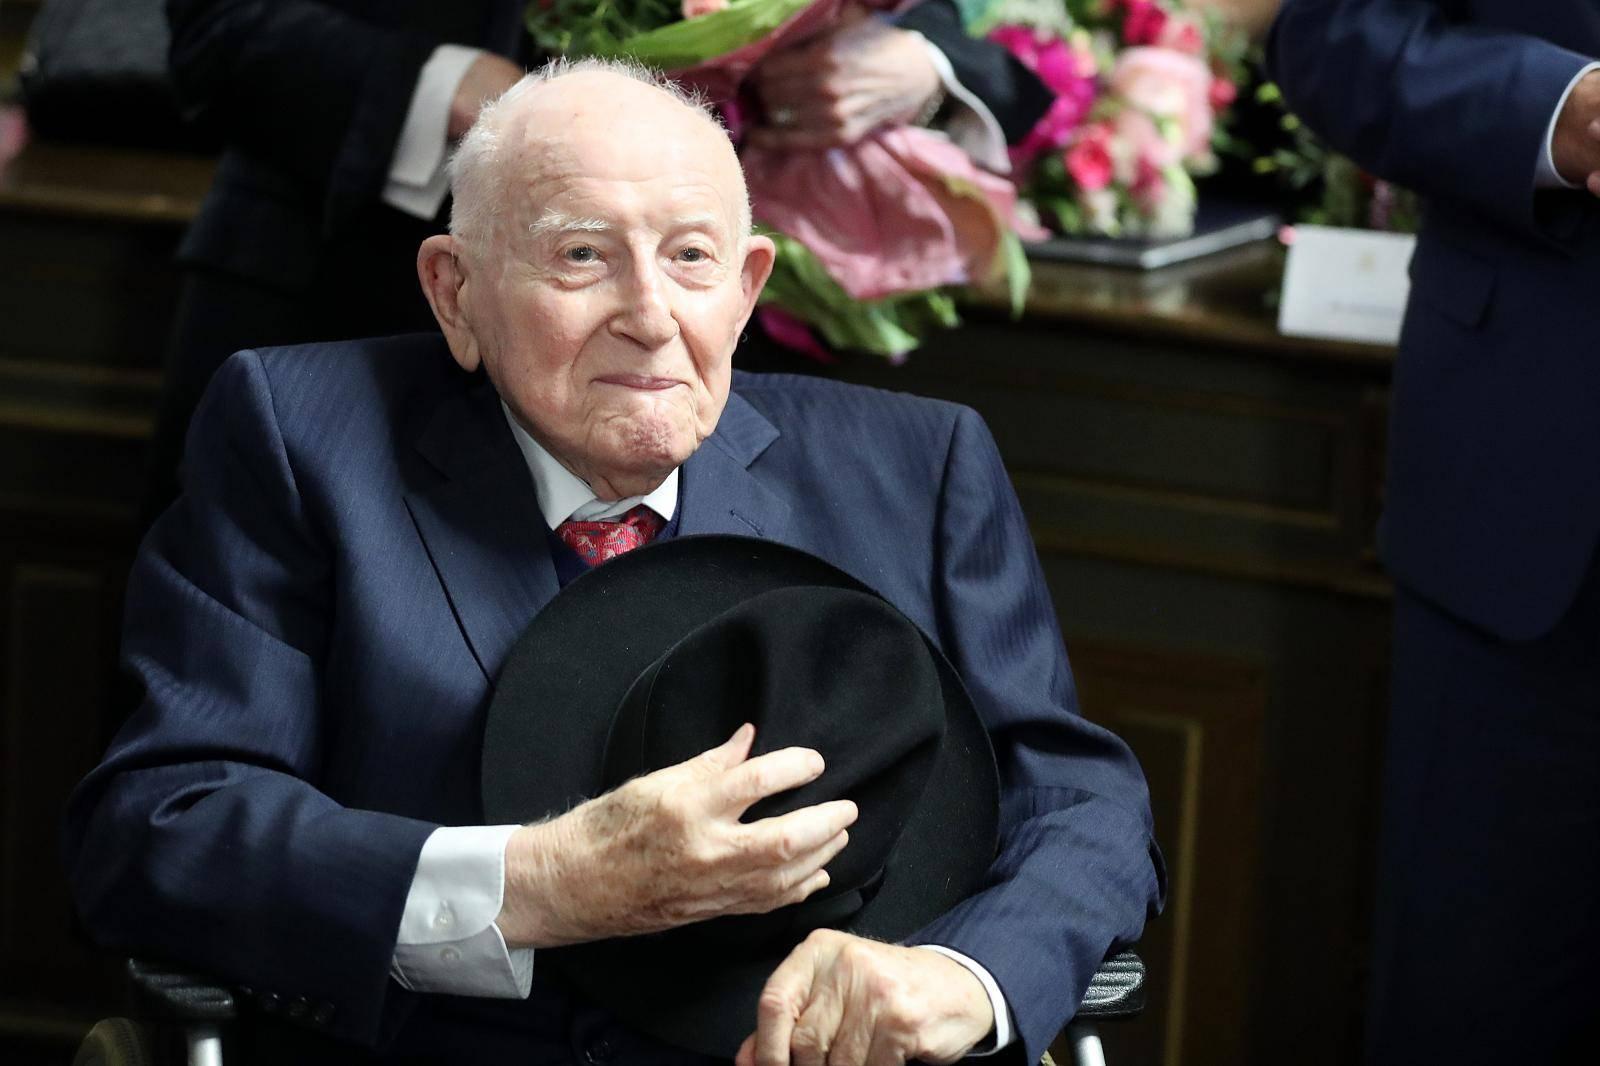 Osakrovac Branko Lustig proglašen počasnim građaninom Zagreba